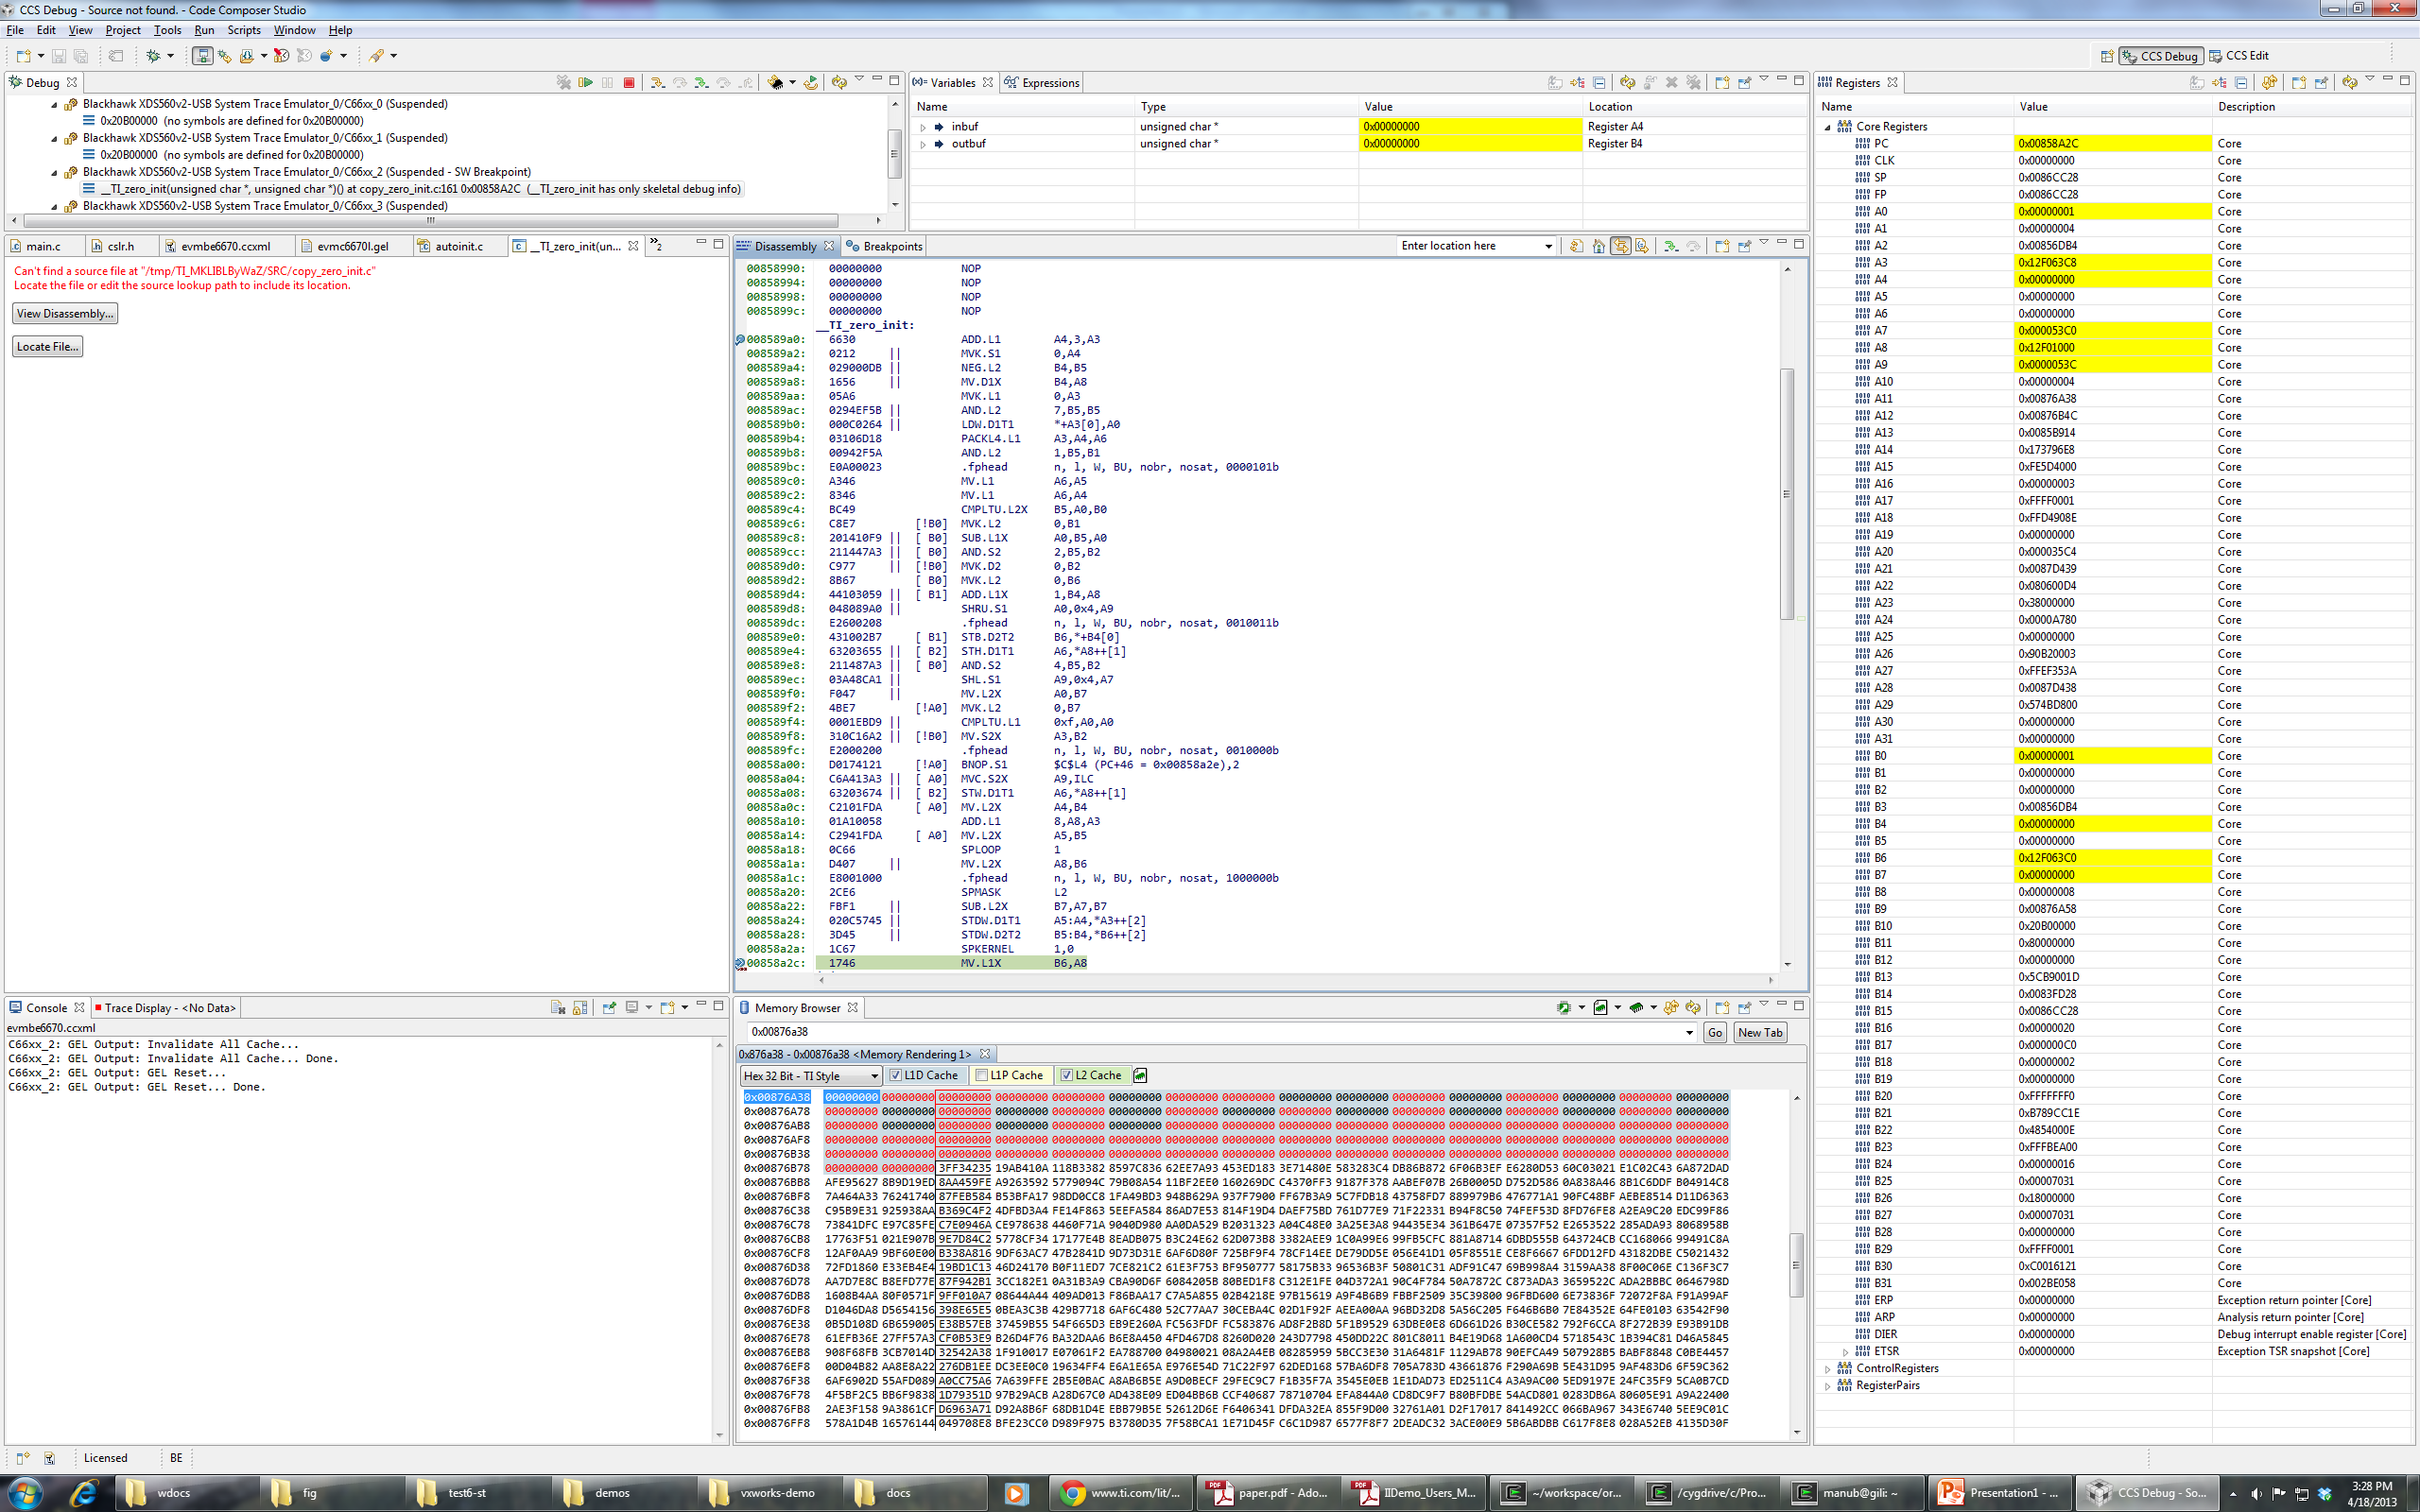 Program load hangs - never reaches symbol main - Processors